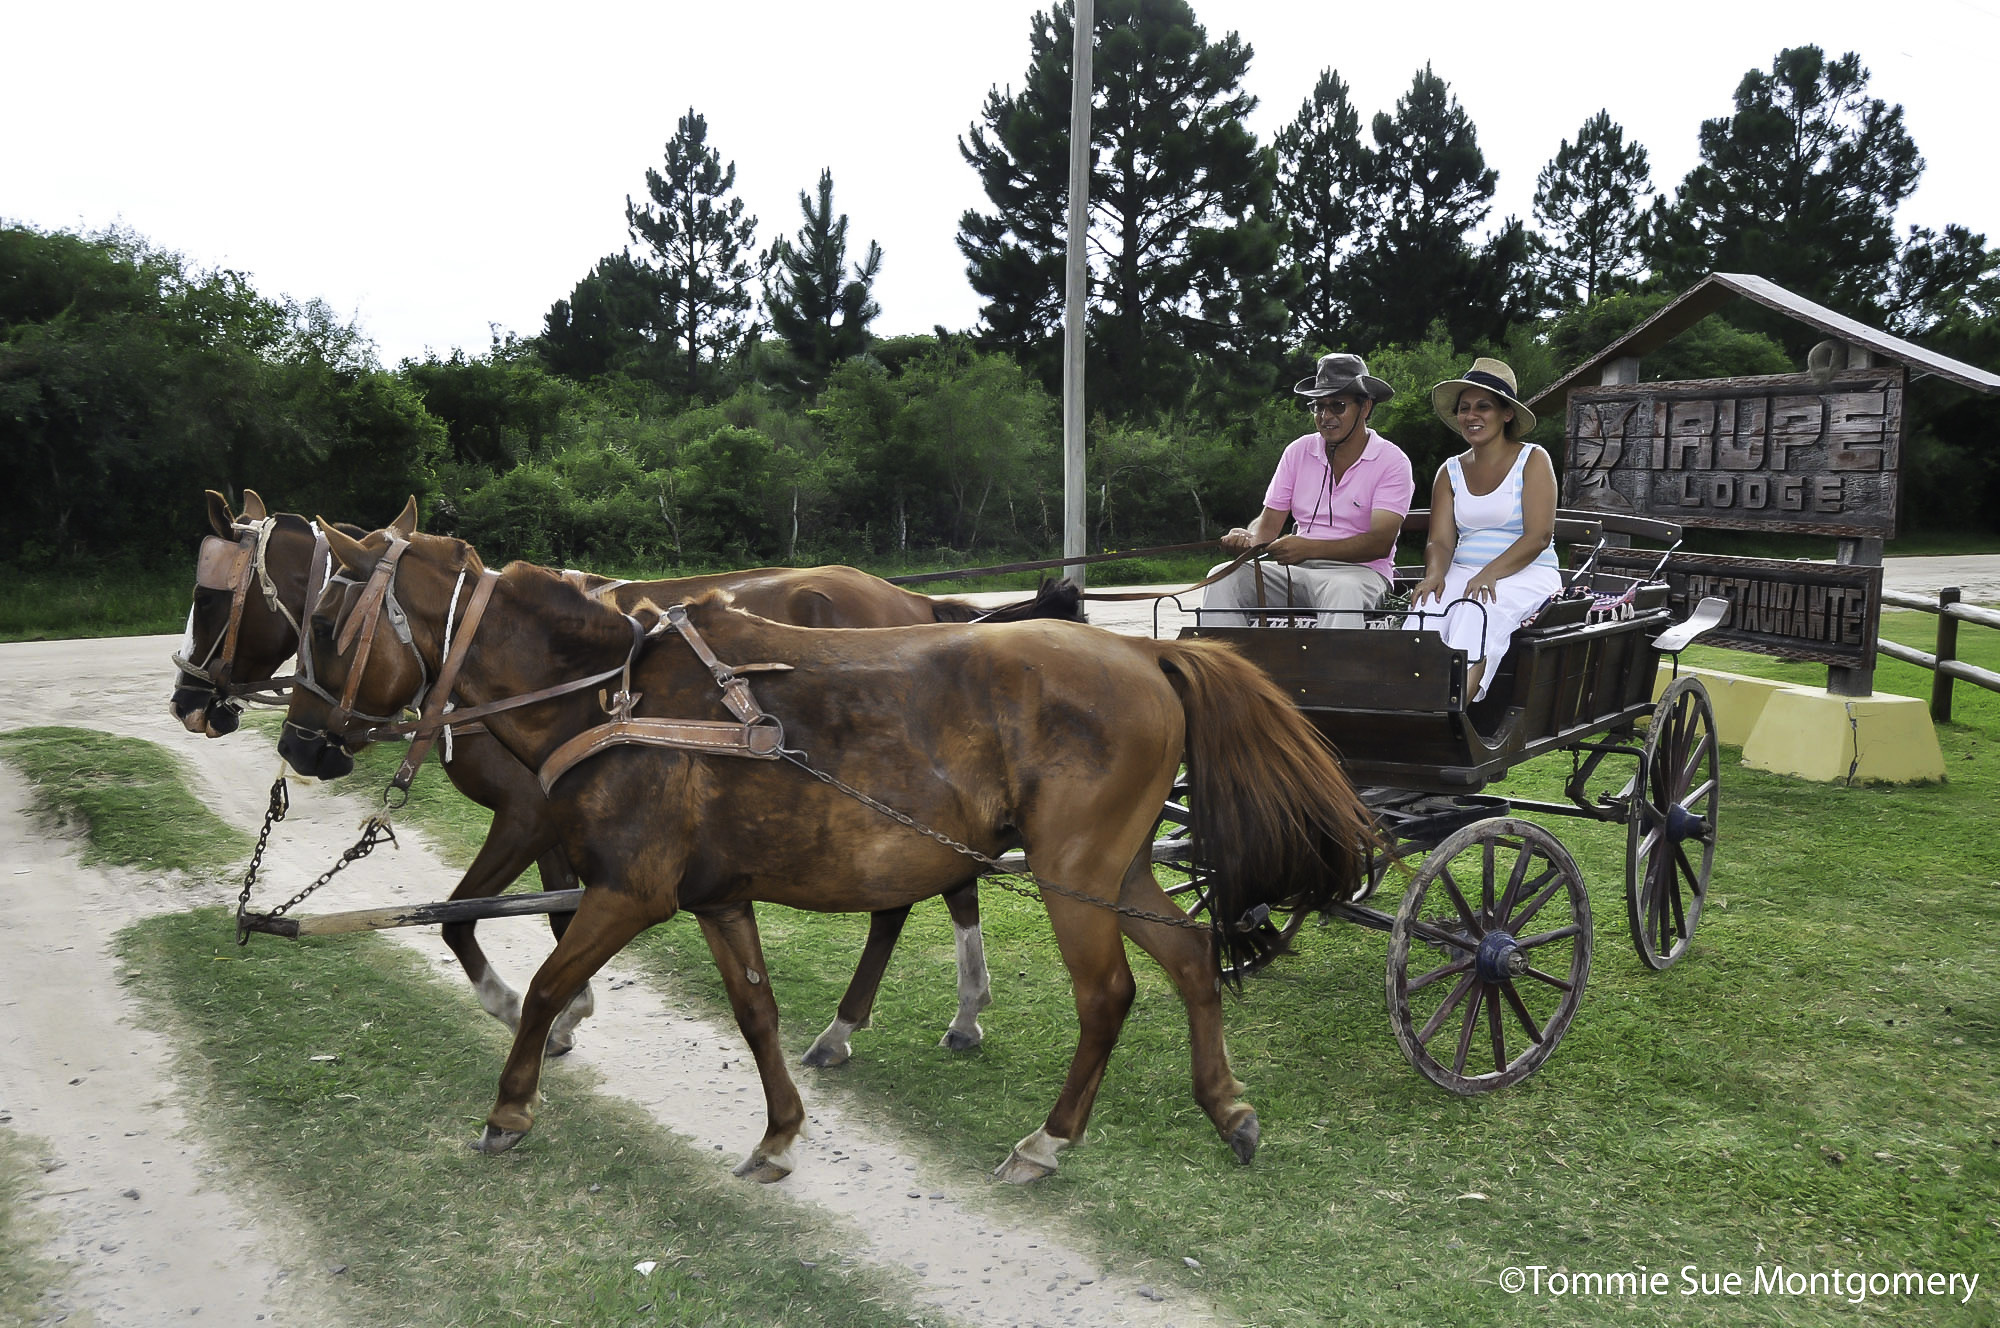 horse-drawn wooden cart